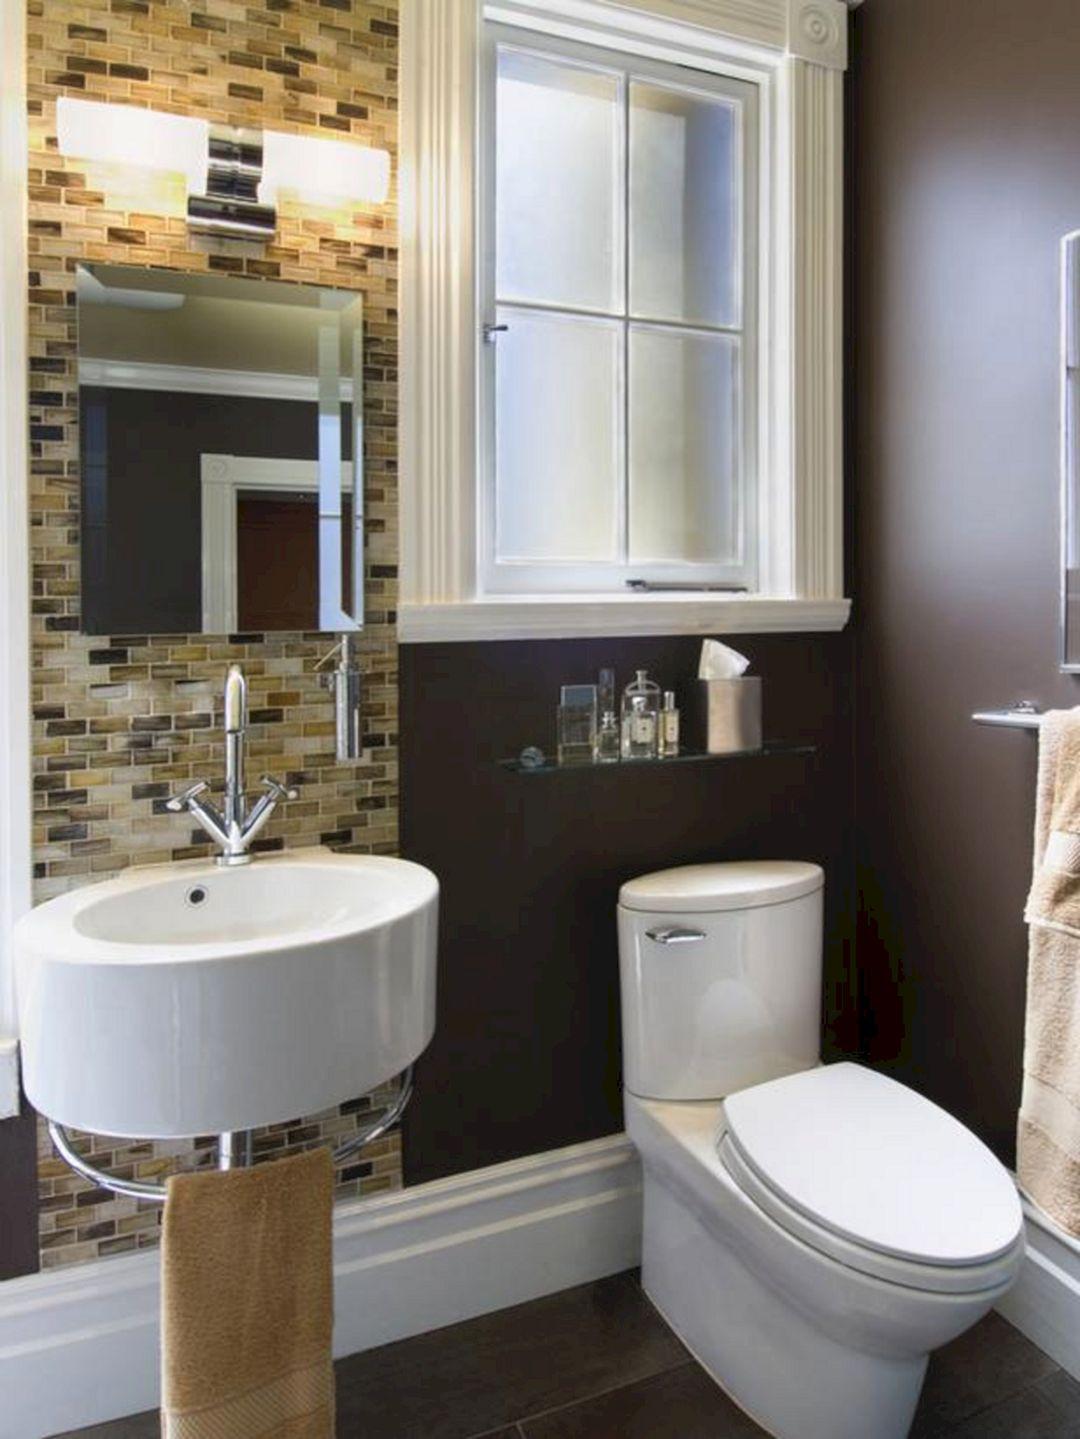 Compact Bathroom Design  HGTV Small Bathroom Design Ideas HGTV Small Bathroom